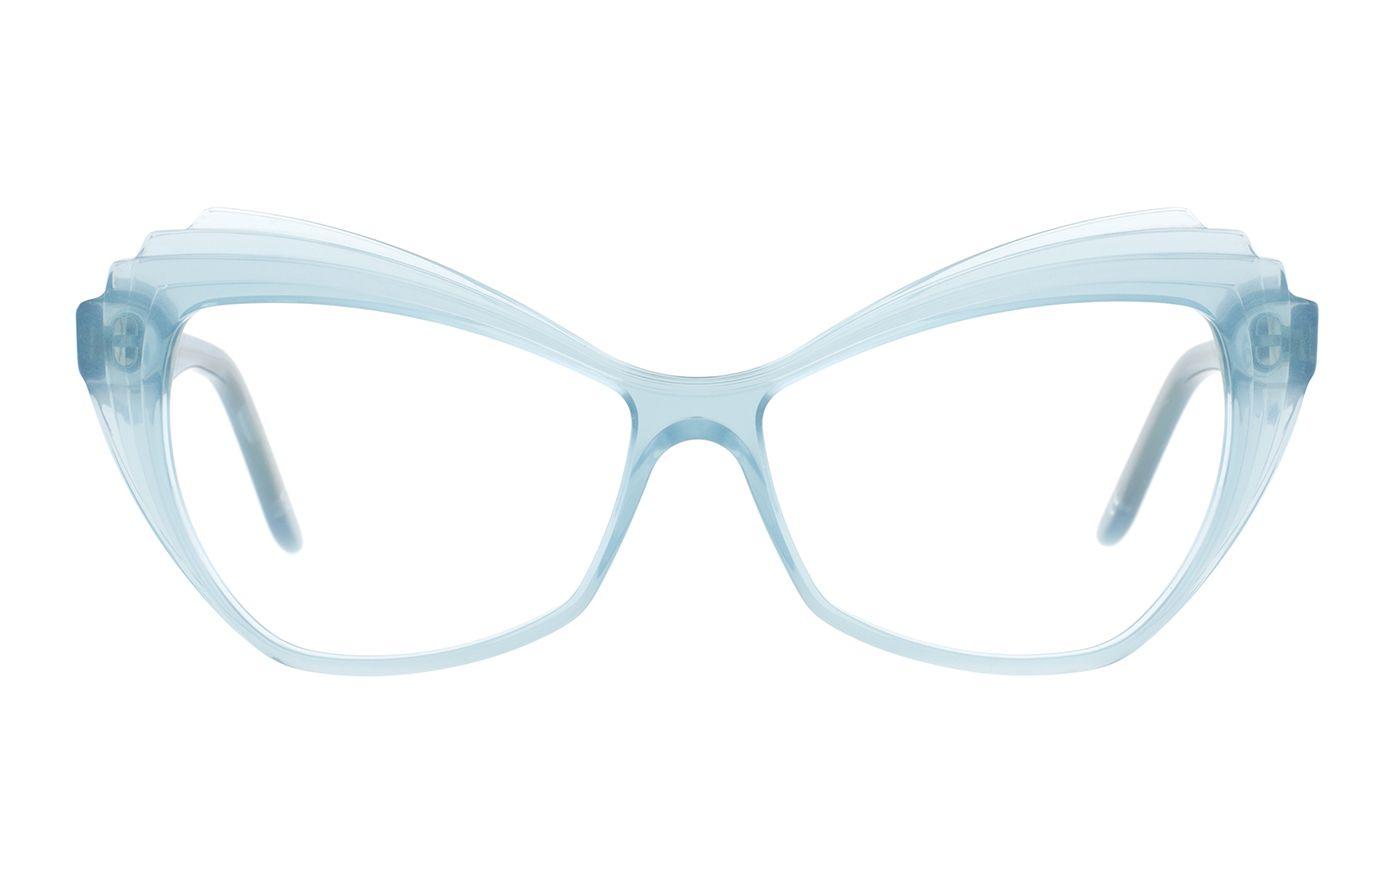 ANDY WOLF, LOVE // 5065 col. E // Eyewear handmade in Austria // Glasses // Fashion // Vintage // Palms //